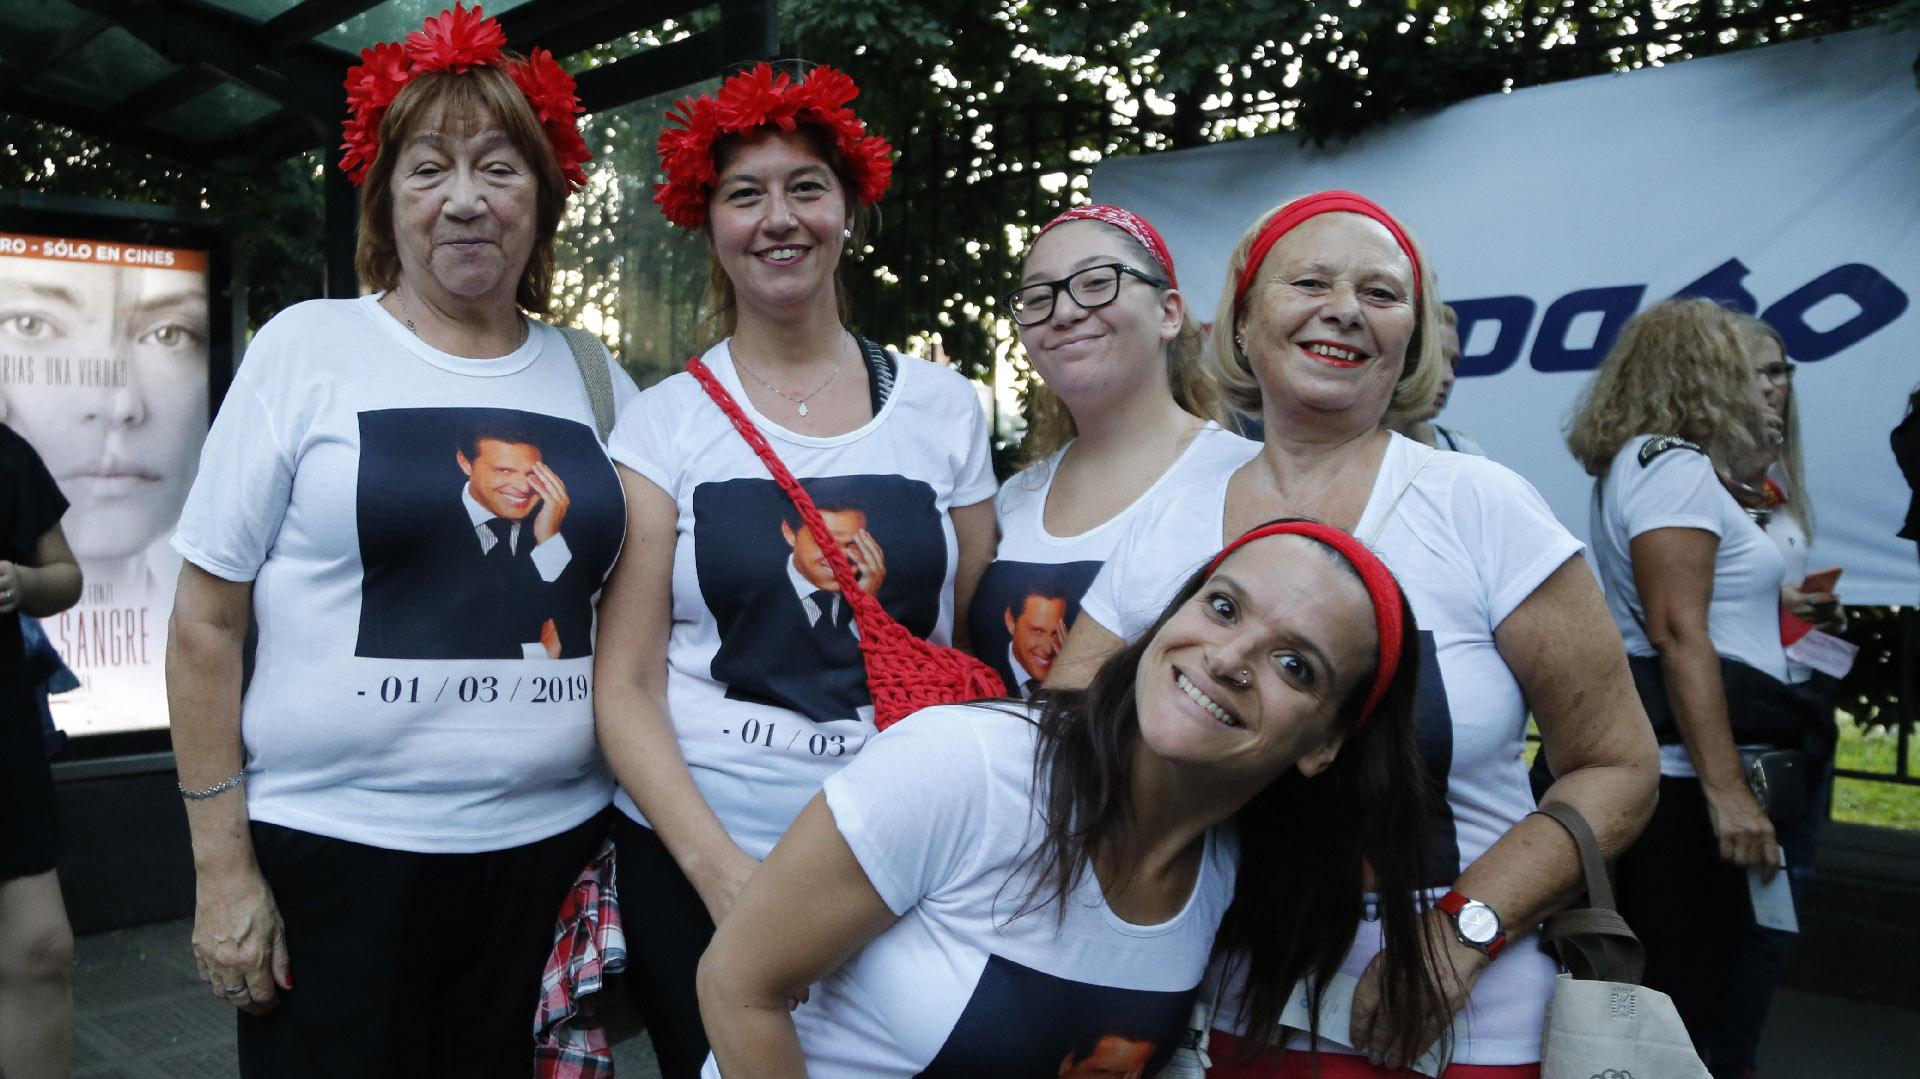 Solo durante esta gira, ya son más de un millón los espectadores que vieron al cantante (Fotos: Nicolás Aboaf / Teleshow)